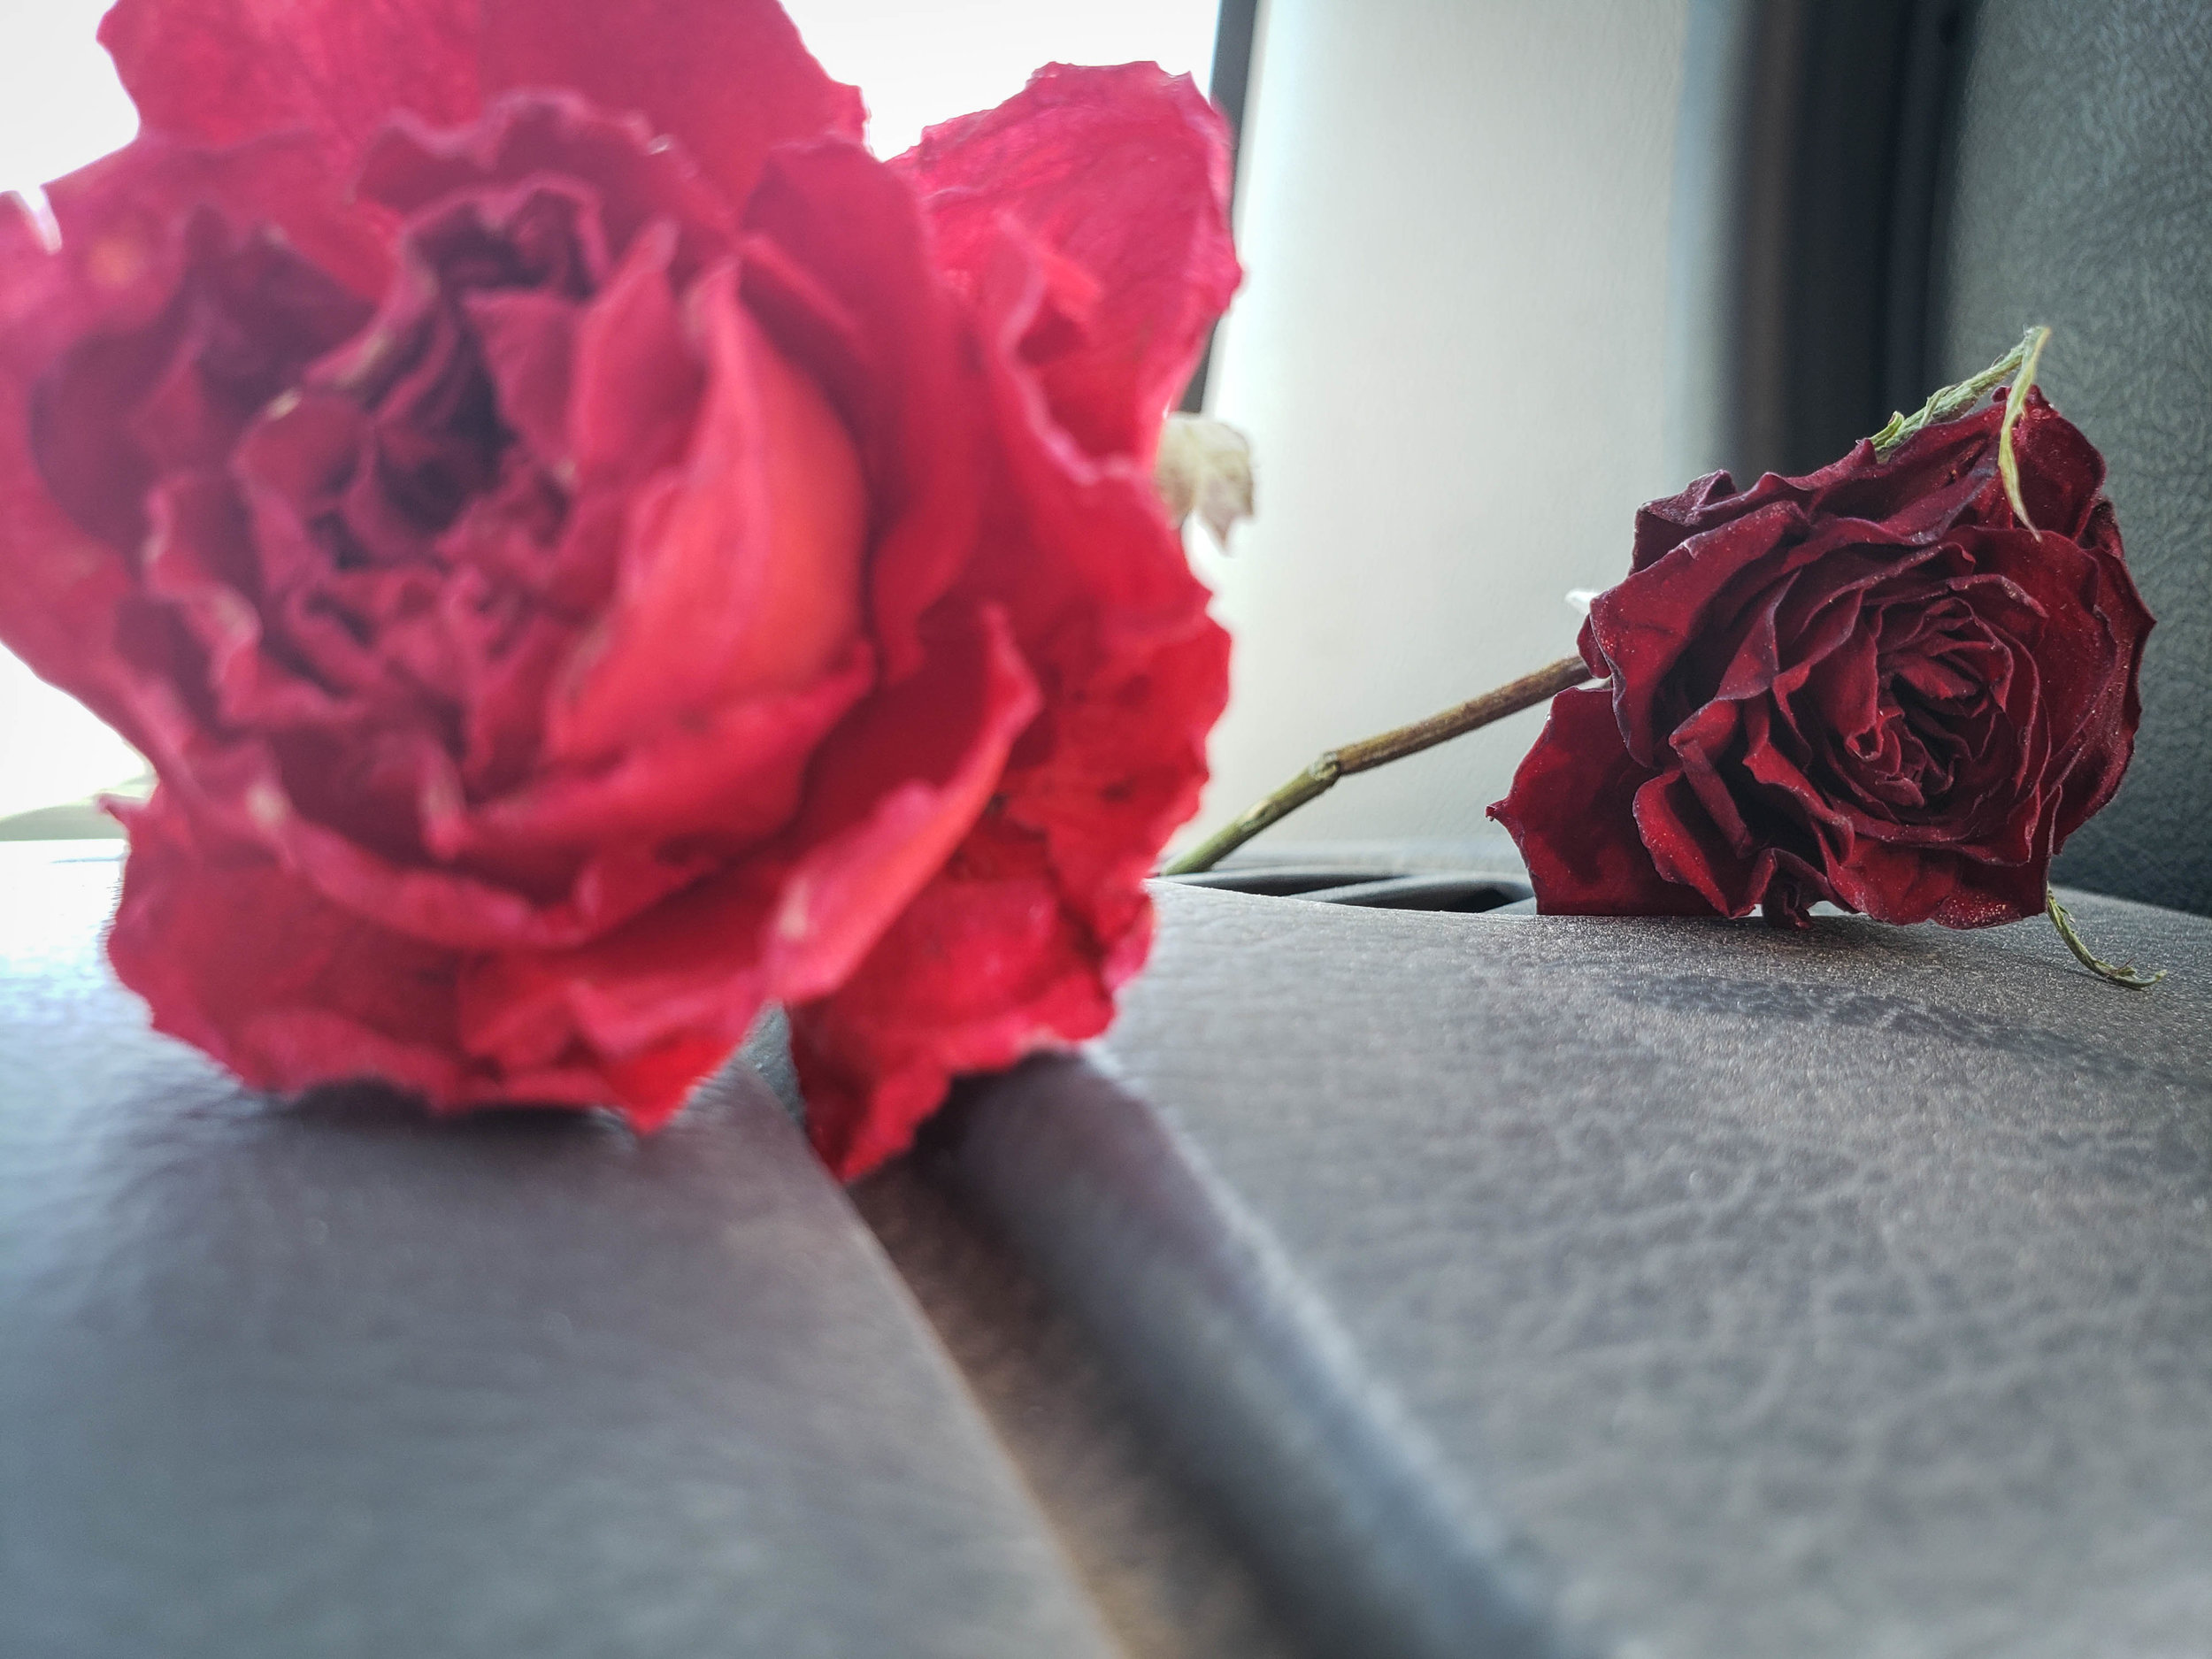 Dead flowers - Blind Spot Creatives